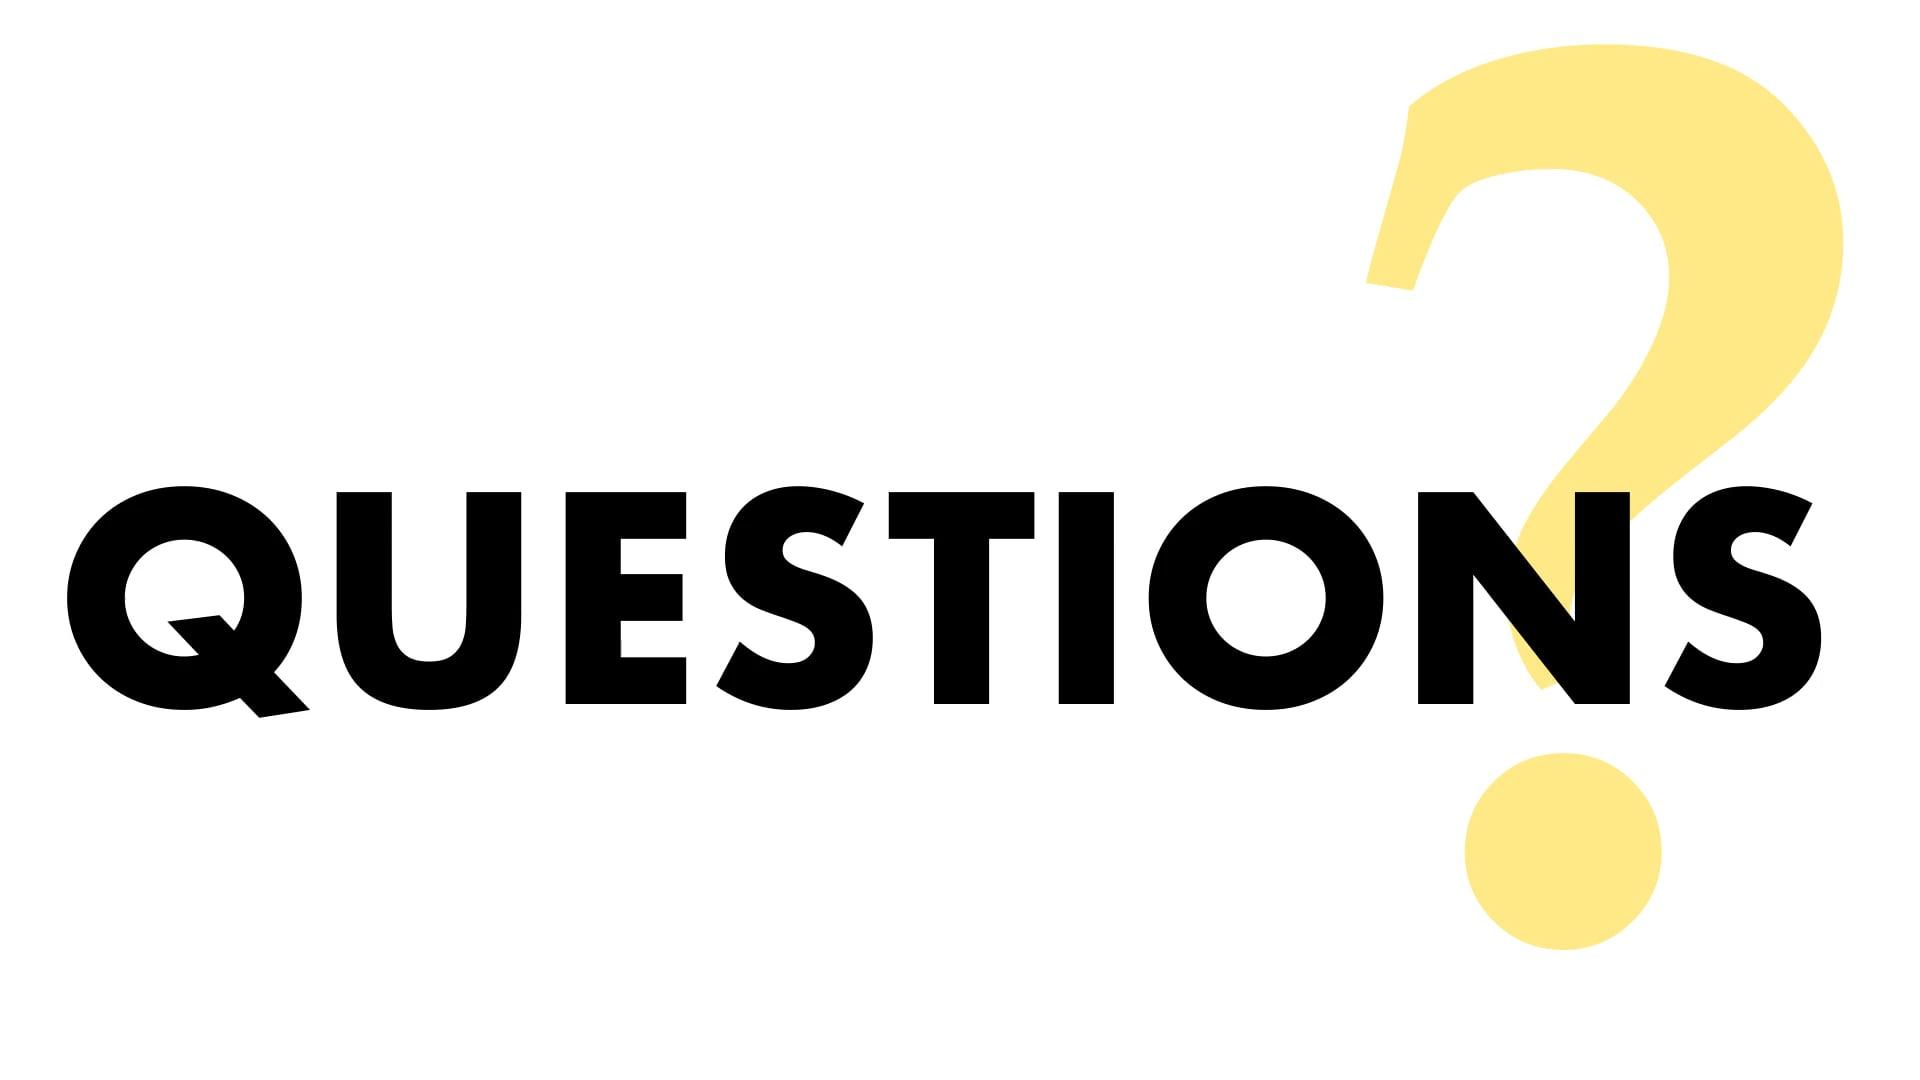 Kinetic Type: Big Life Questions